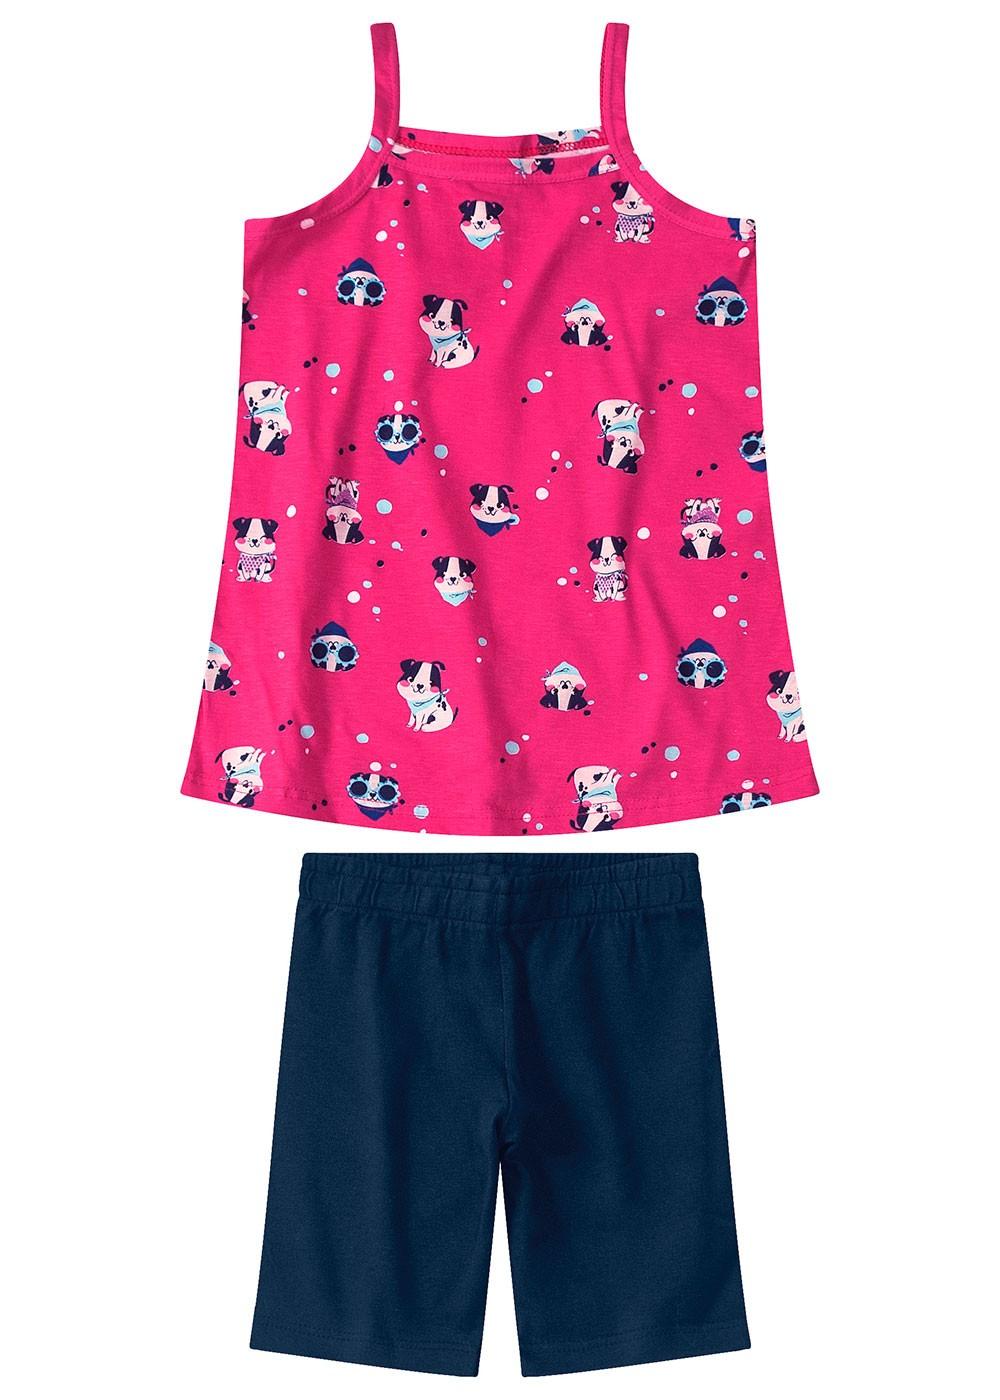 Conjunto Infantil Feminino Rosa - DOG - Malwee